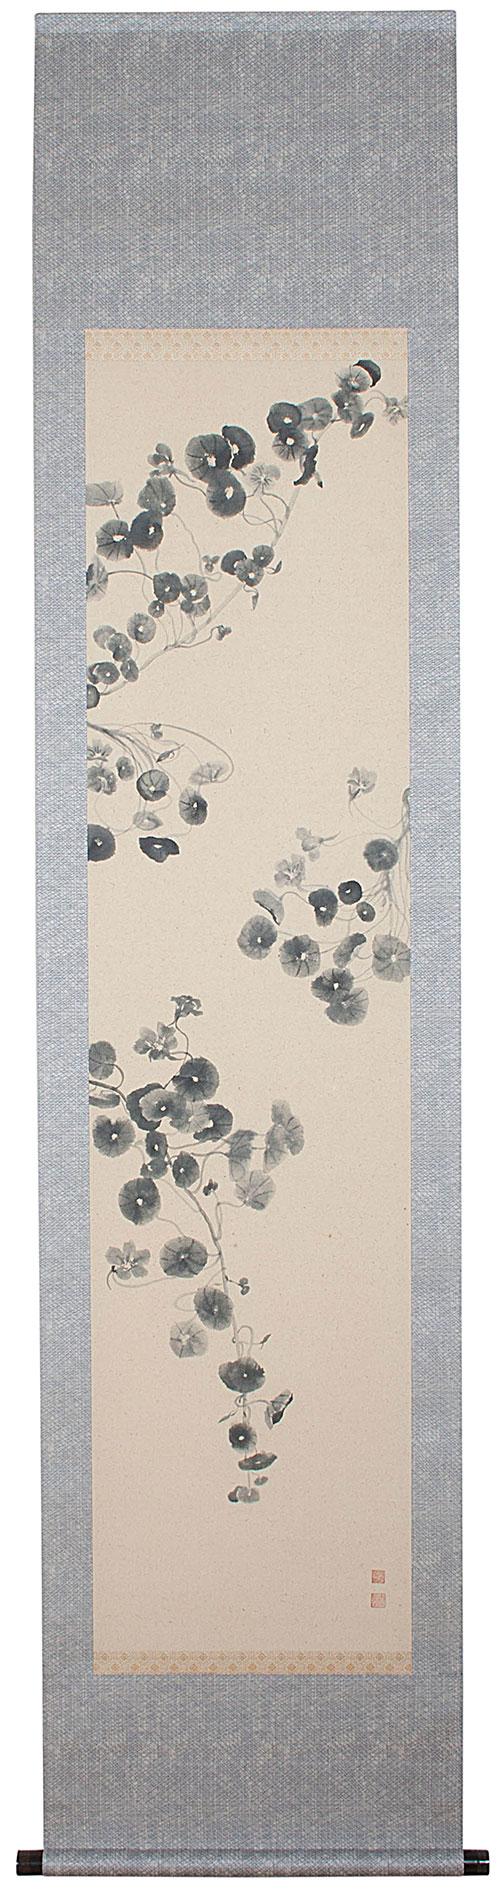 190-Kapuzinerkresse-auf-blau-Grünem-GrundIMG_4985-Kopie.jpg